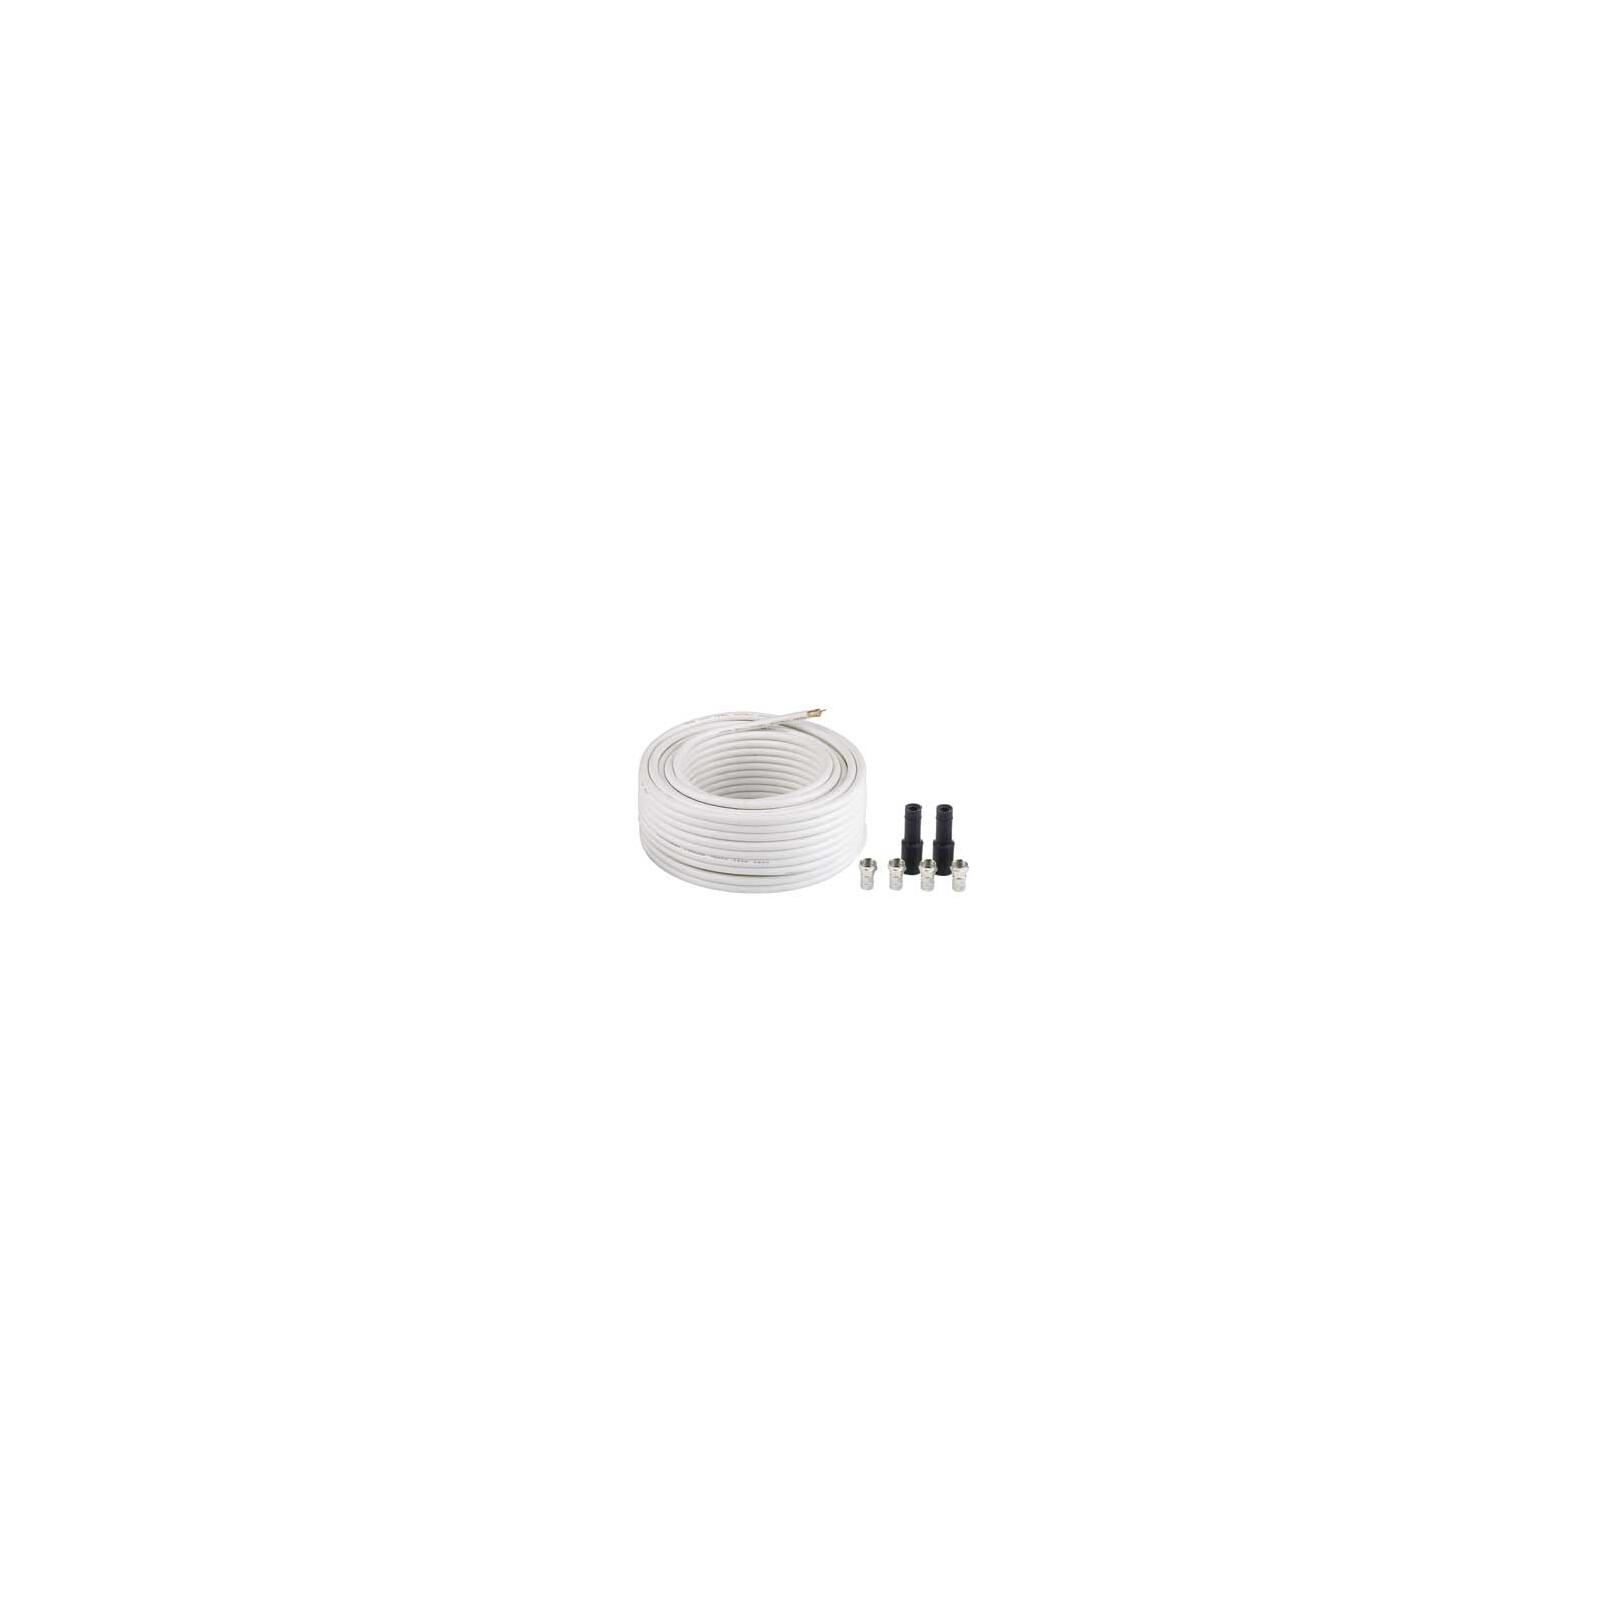 "Hama 56661 SAT-Anschluss-Kit ""Digital"", 100 dB, 20 m"